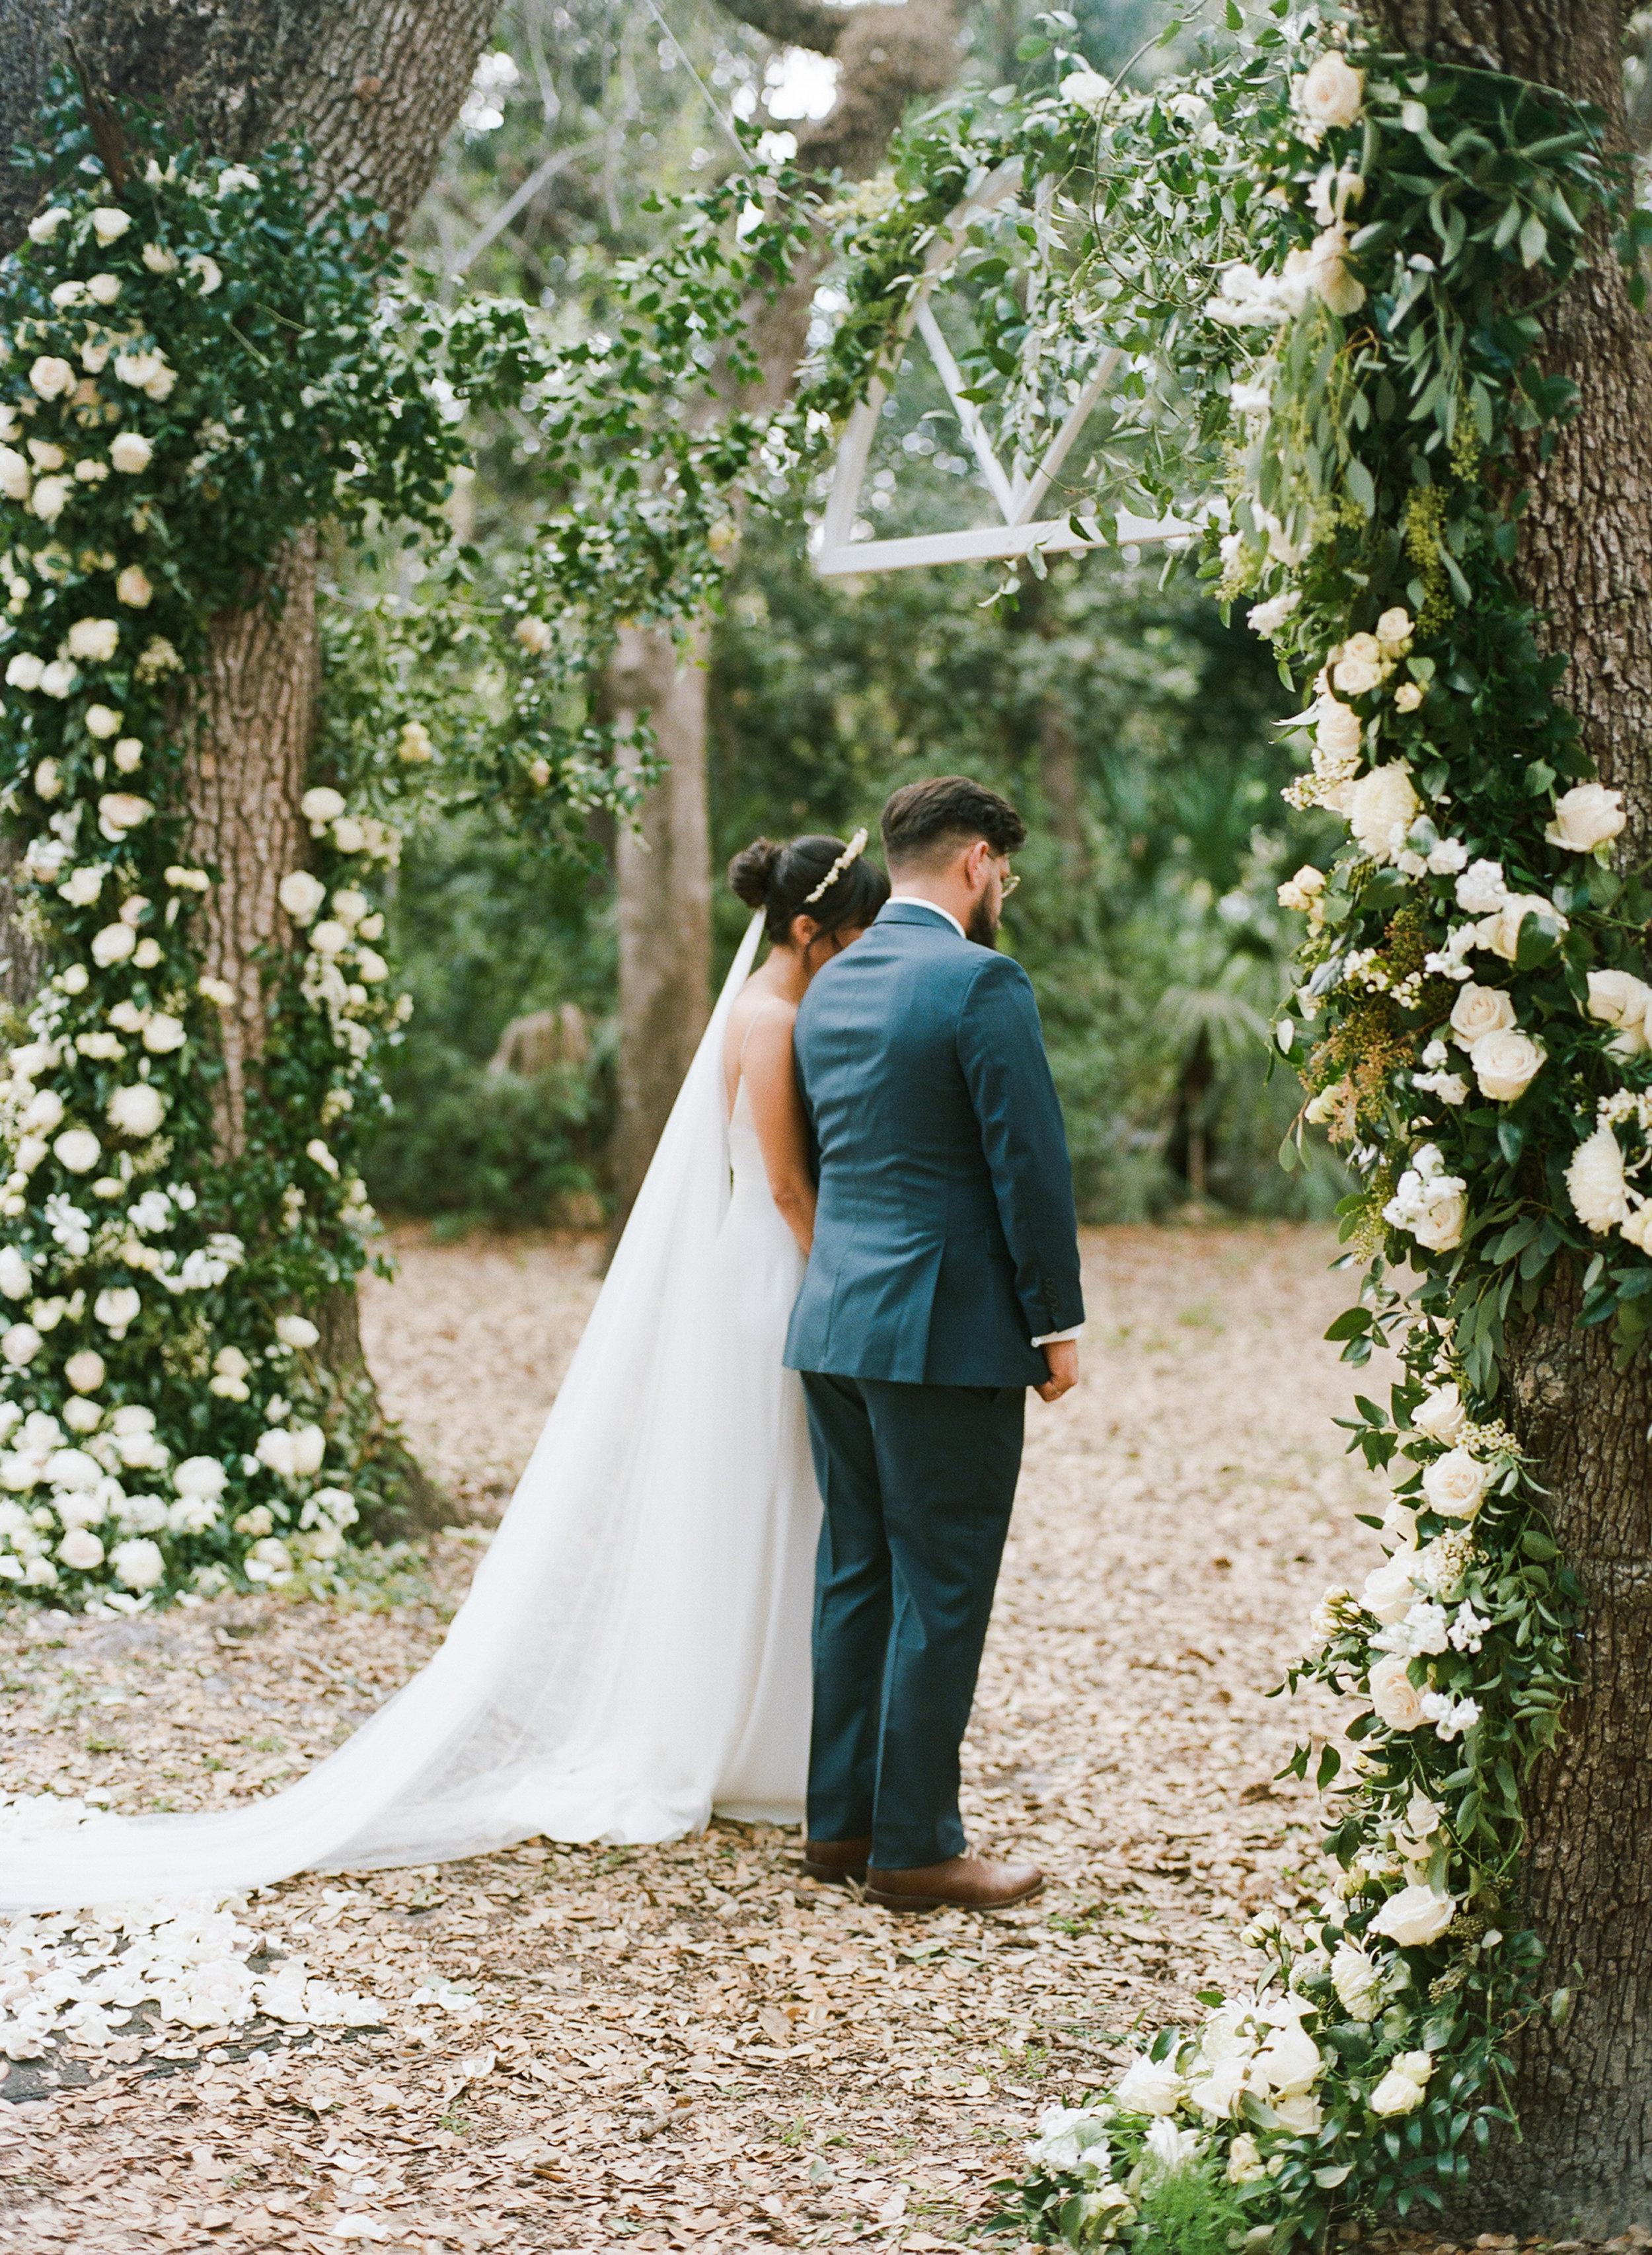 31-outdoor-park-wedding-ceremony.jpg